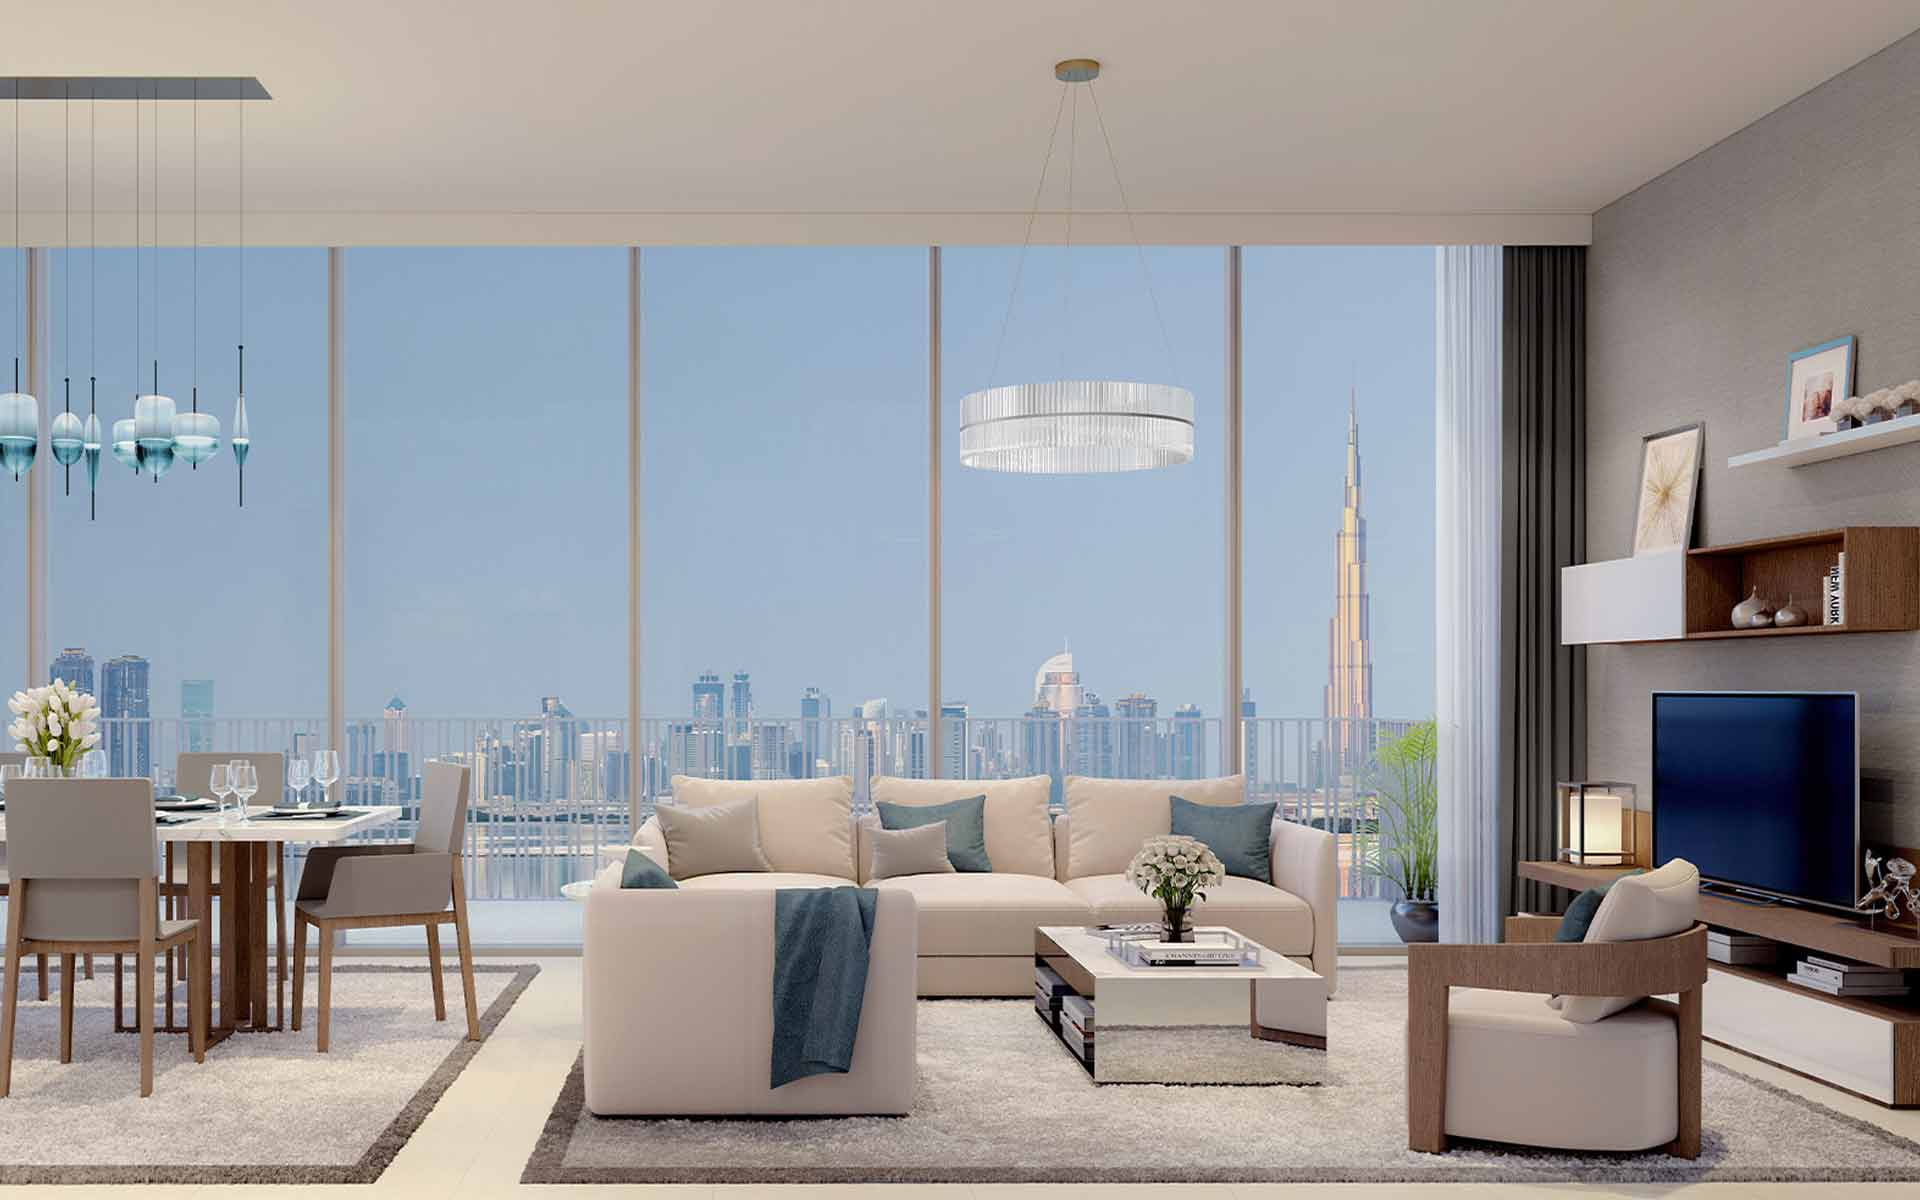 exclusive-2-bedroom-with-huge-balcony-in-harbour-gate